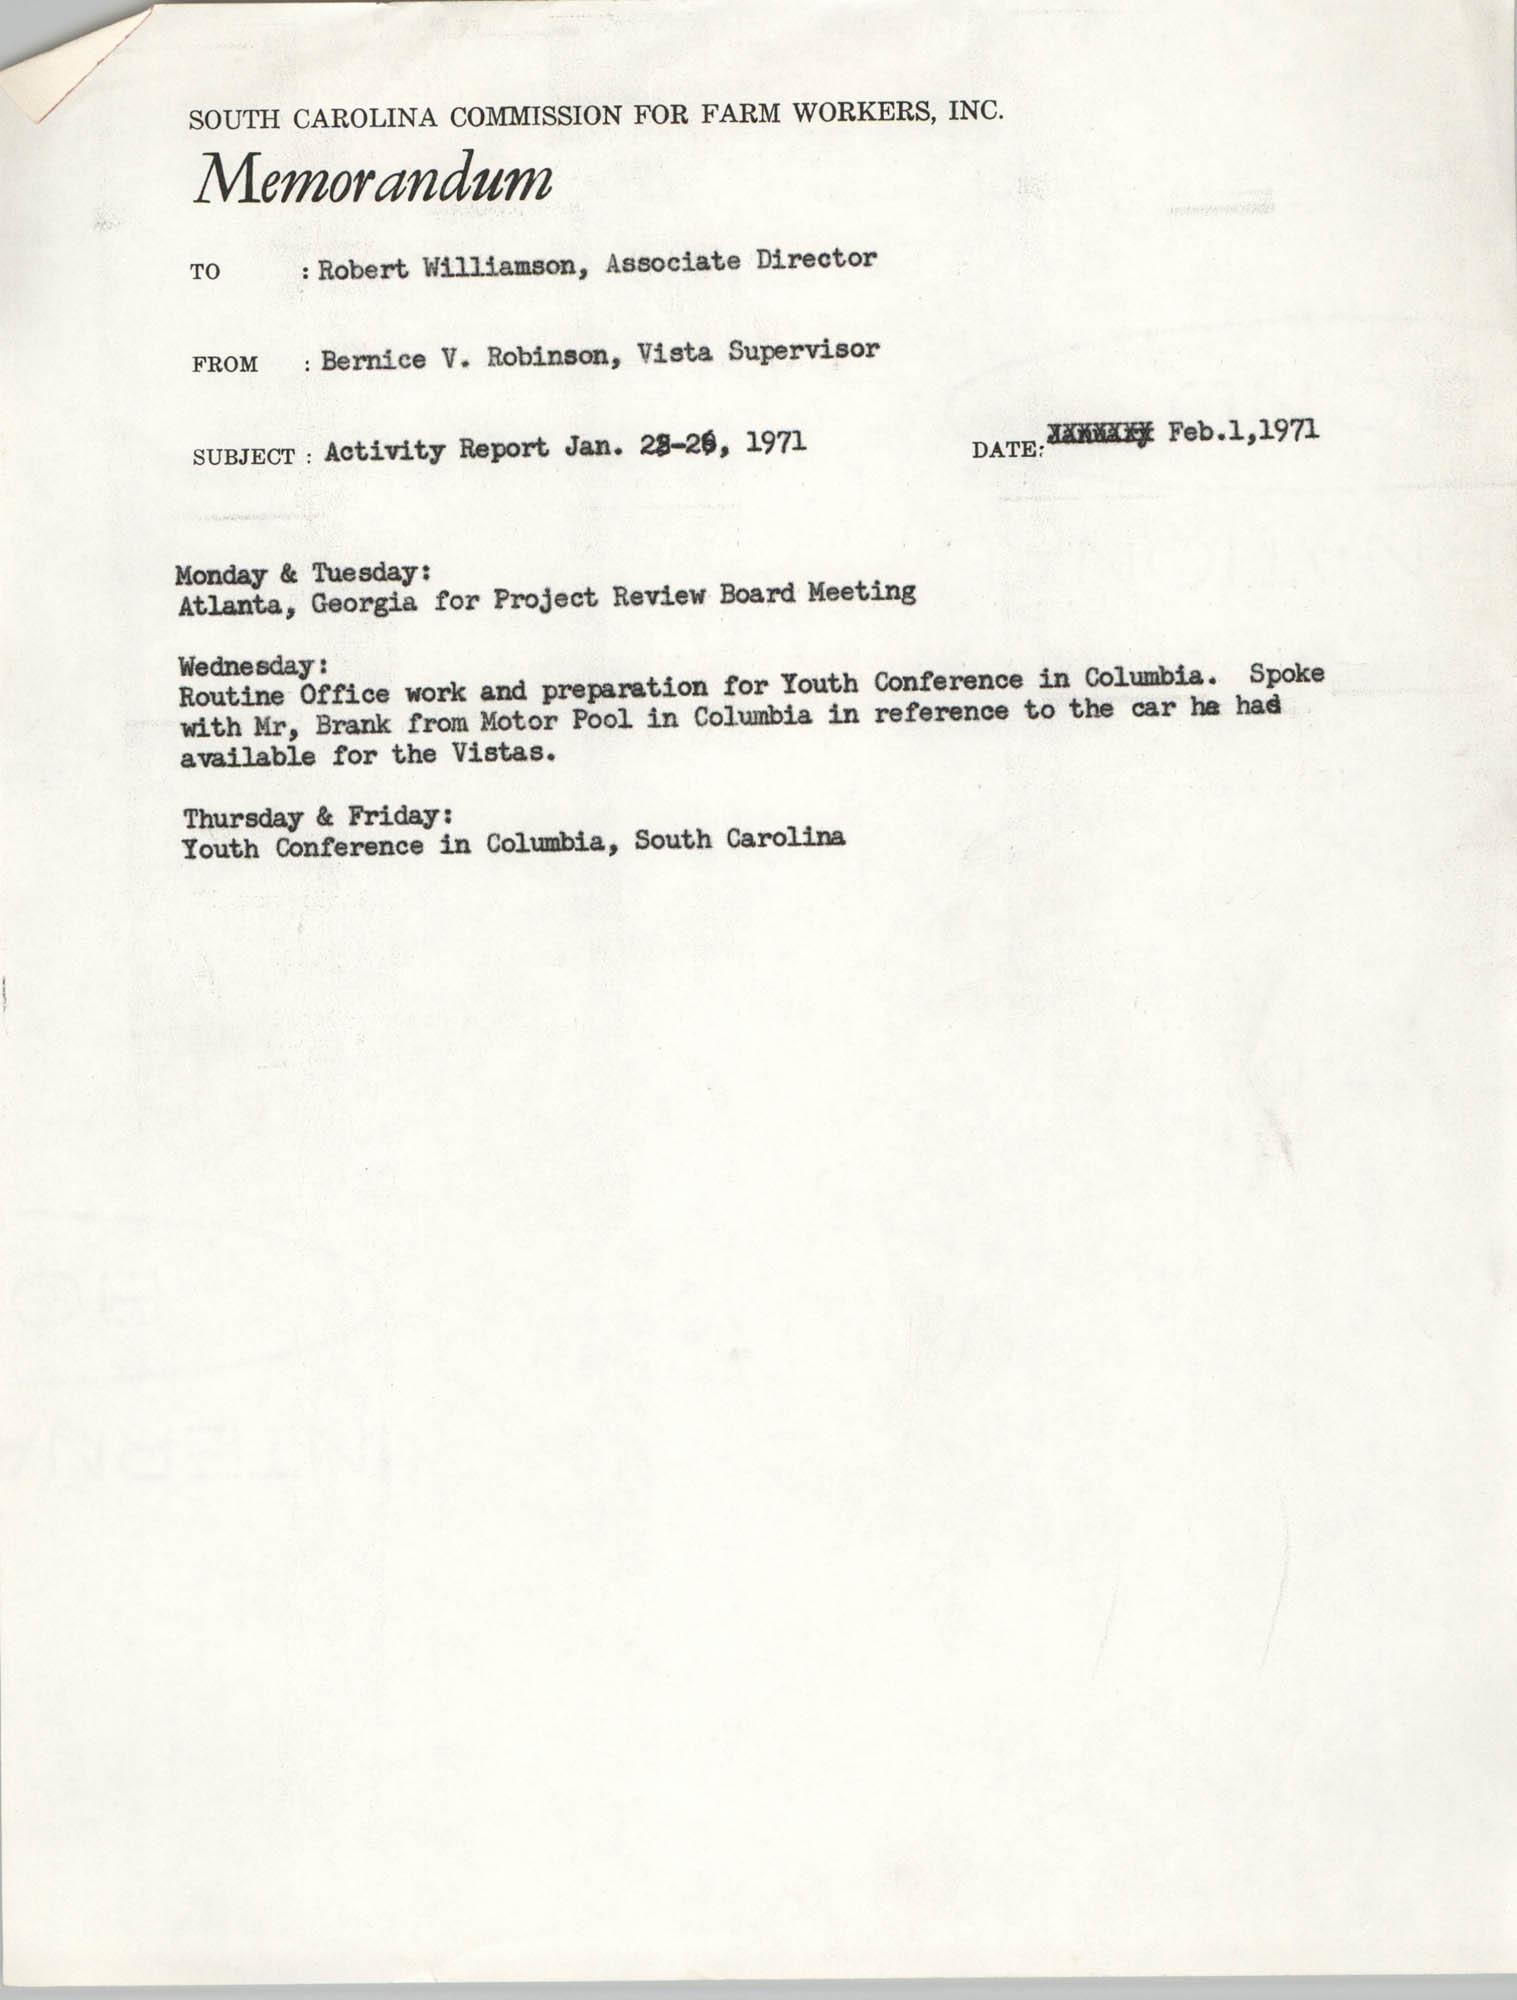 Memorandum from Bernice V. Robinson to Robert Williamson, February 1, 1971